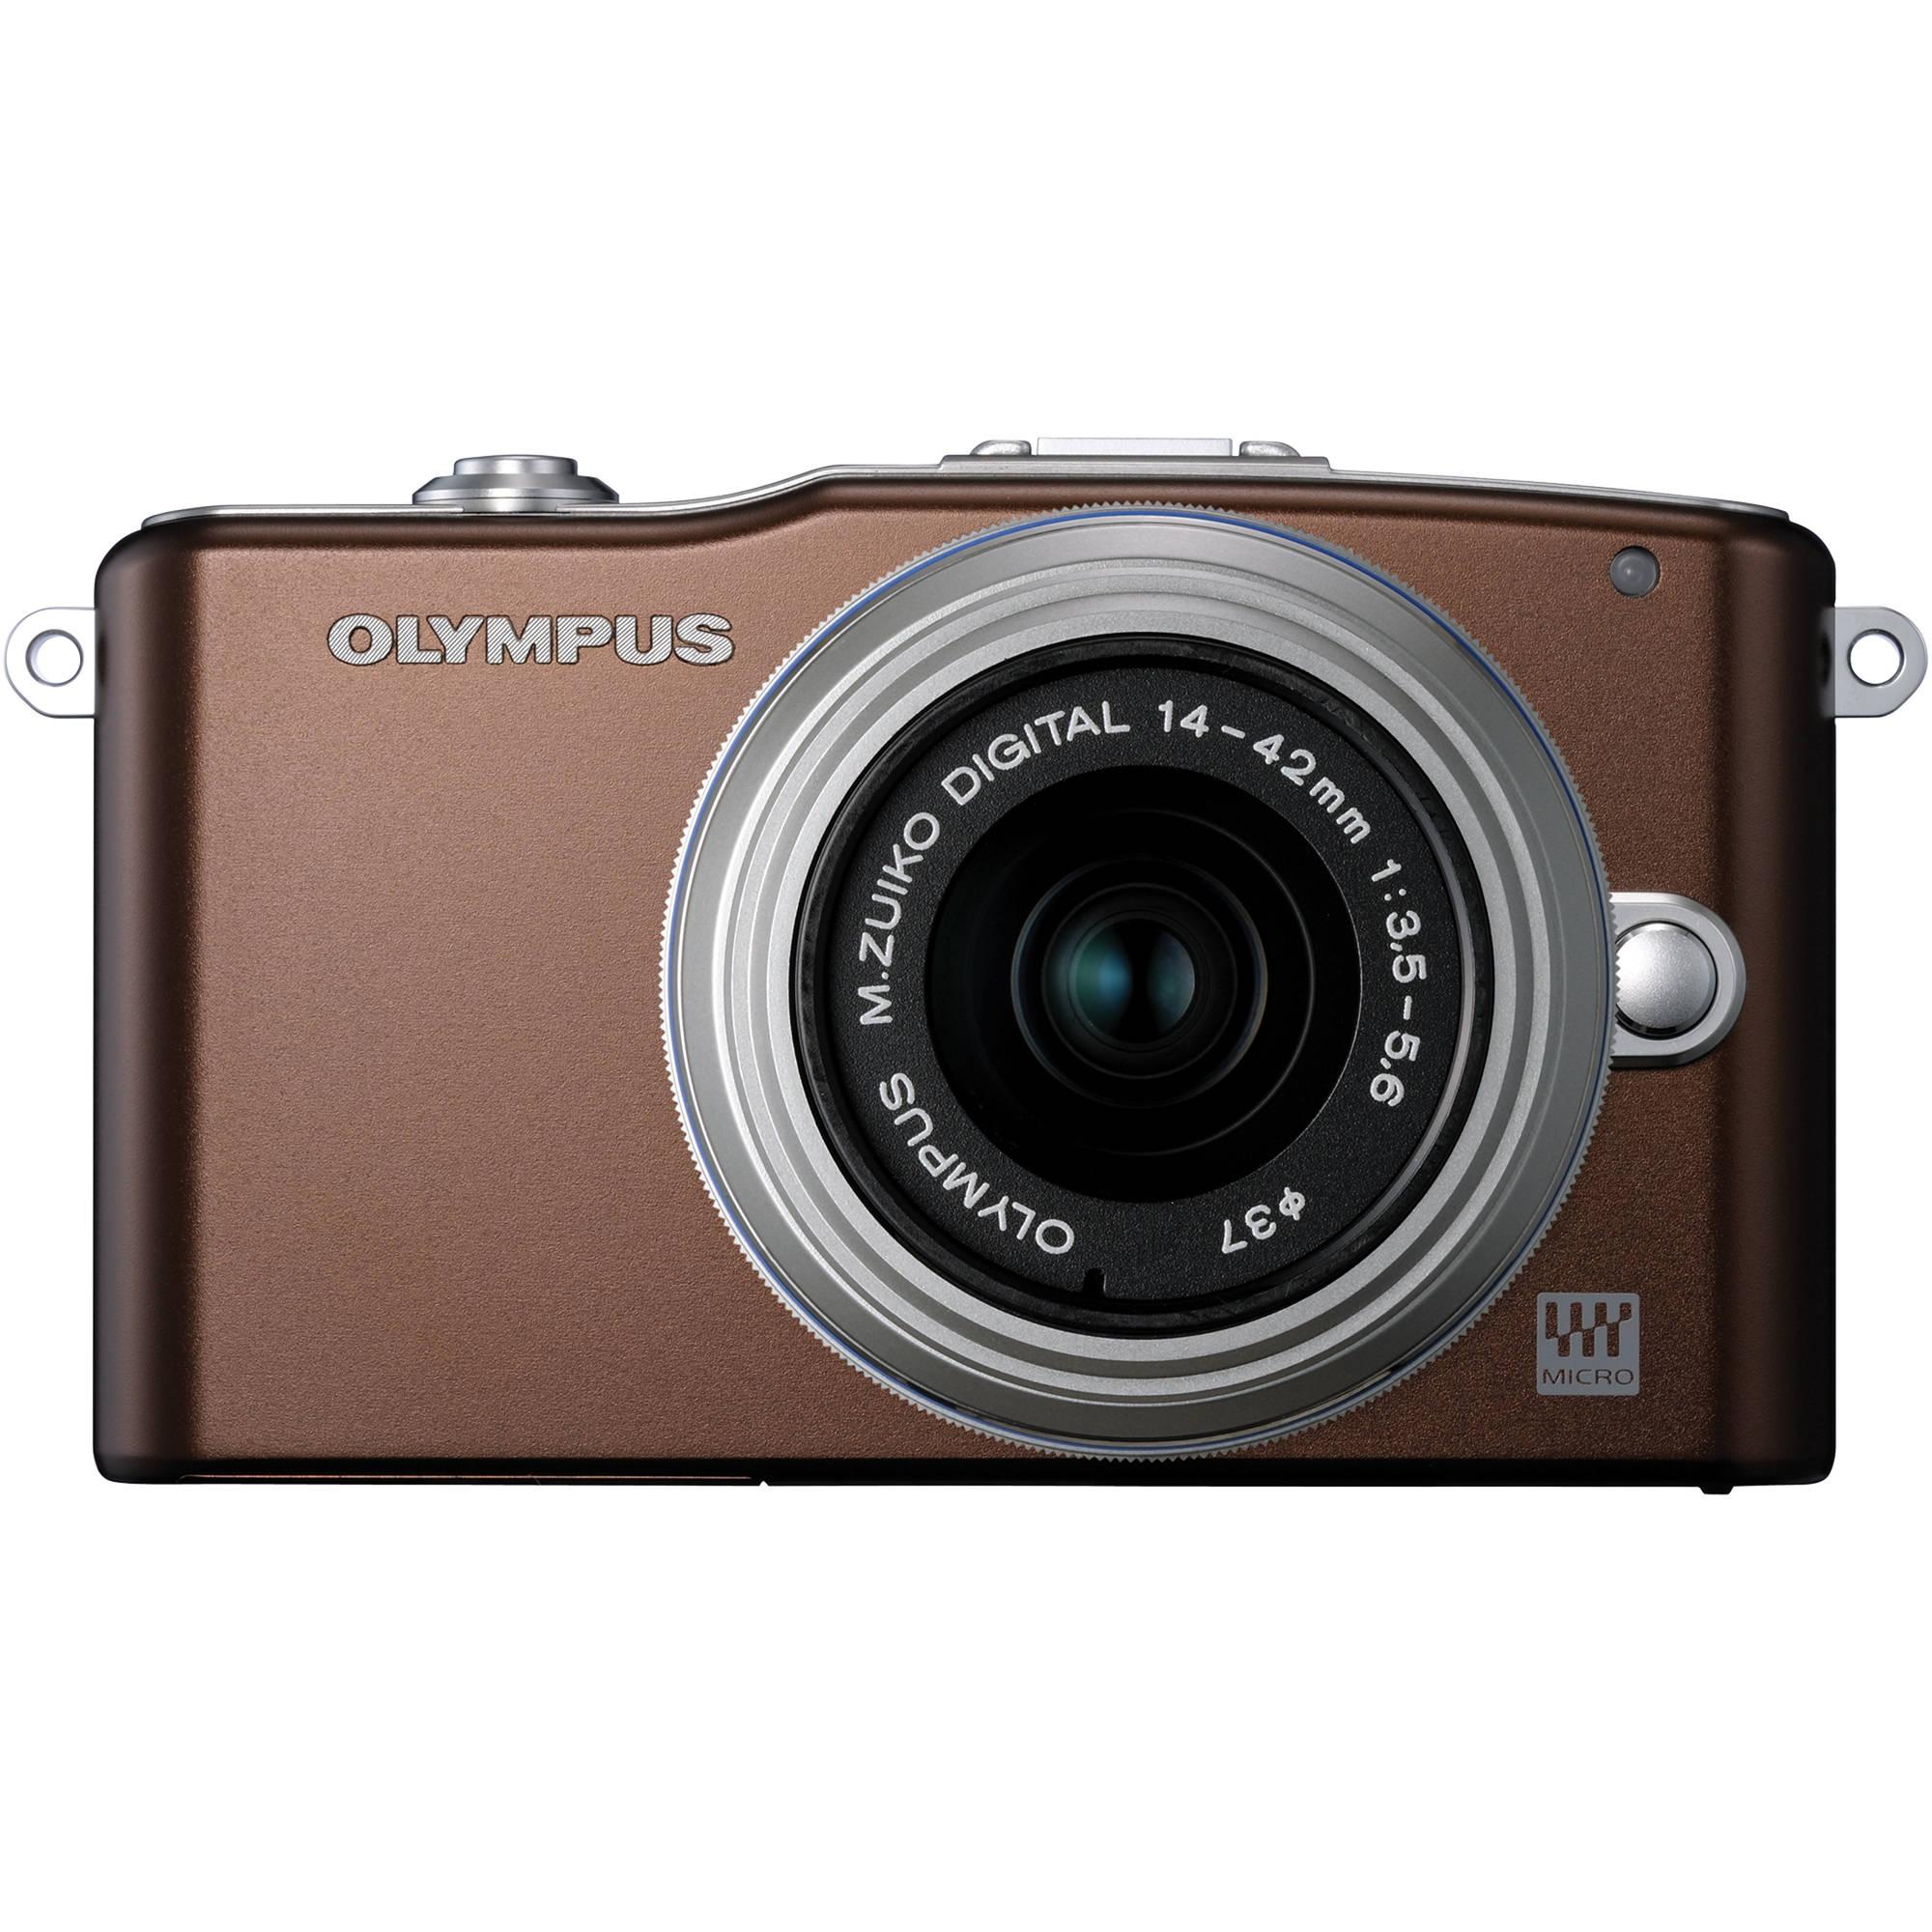 olympus e pm1 mirrorless micro four thirds digital v206011nu000 rh bhphotovideo com E- PM1 olympus e-pm1 instruction manual